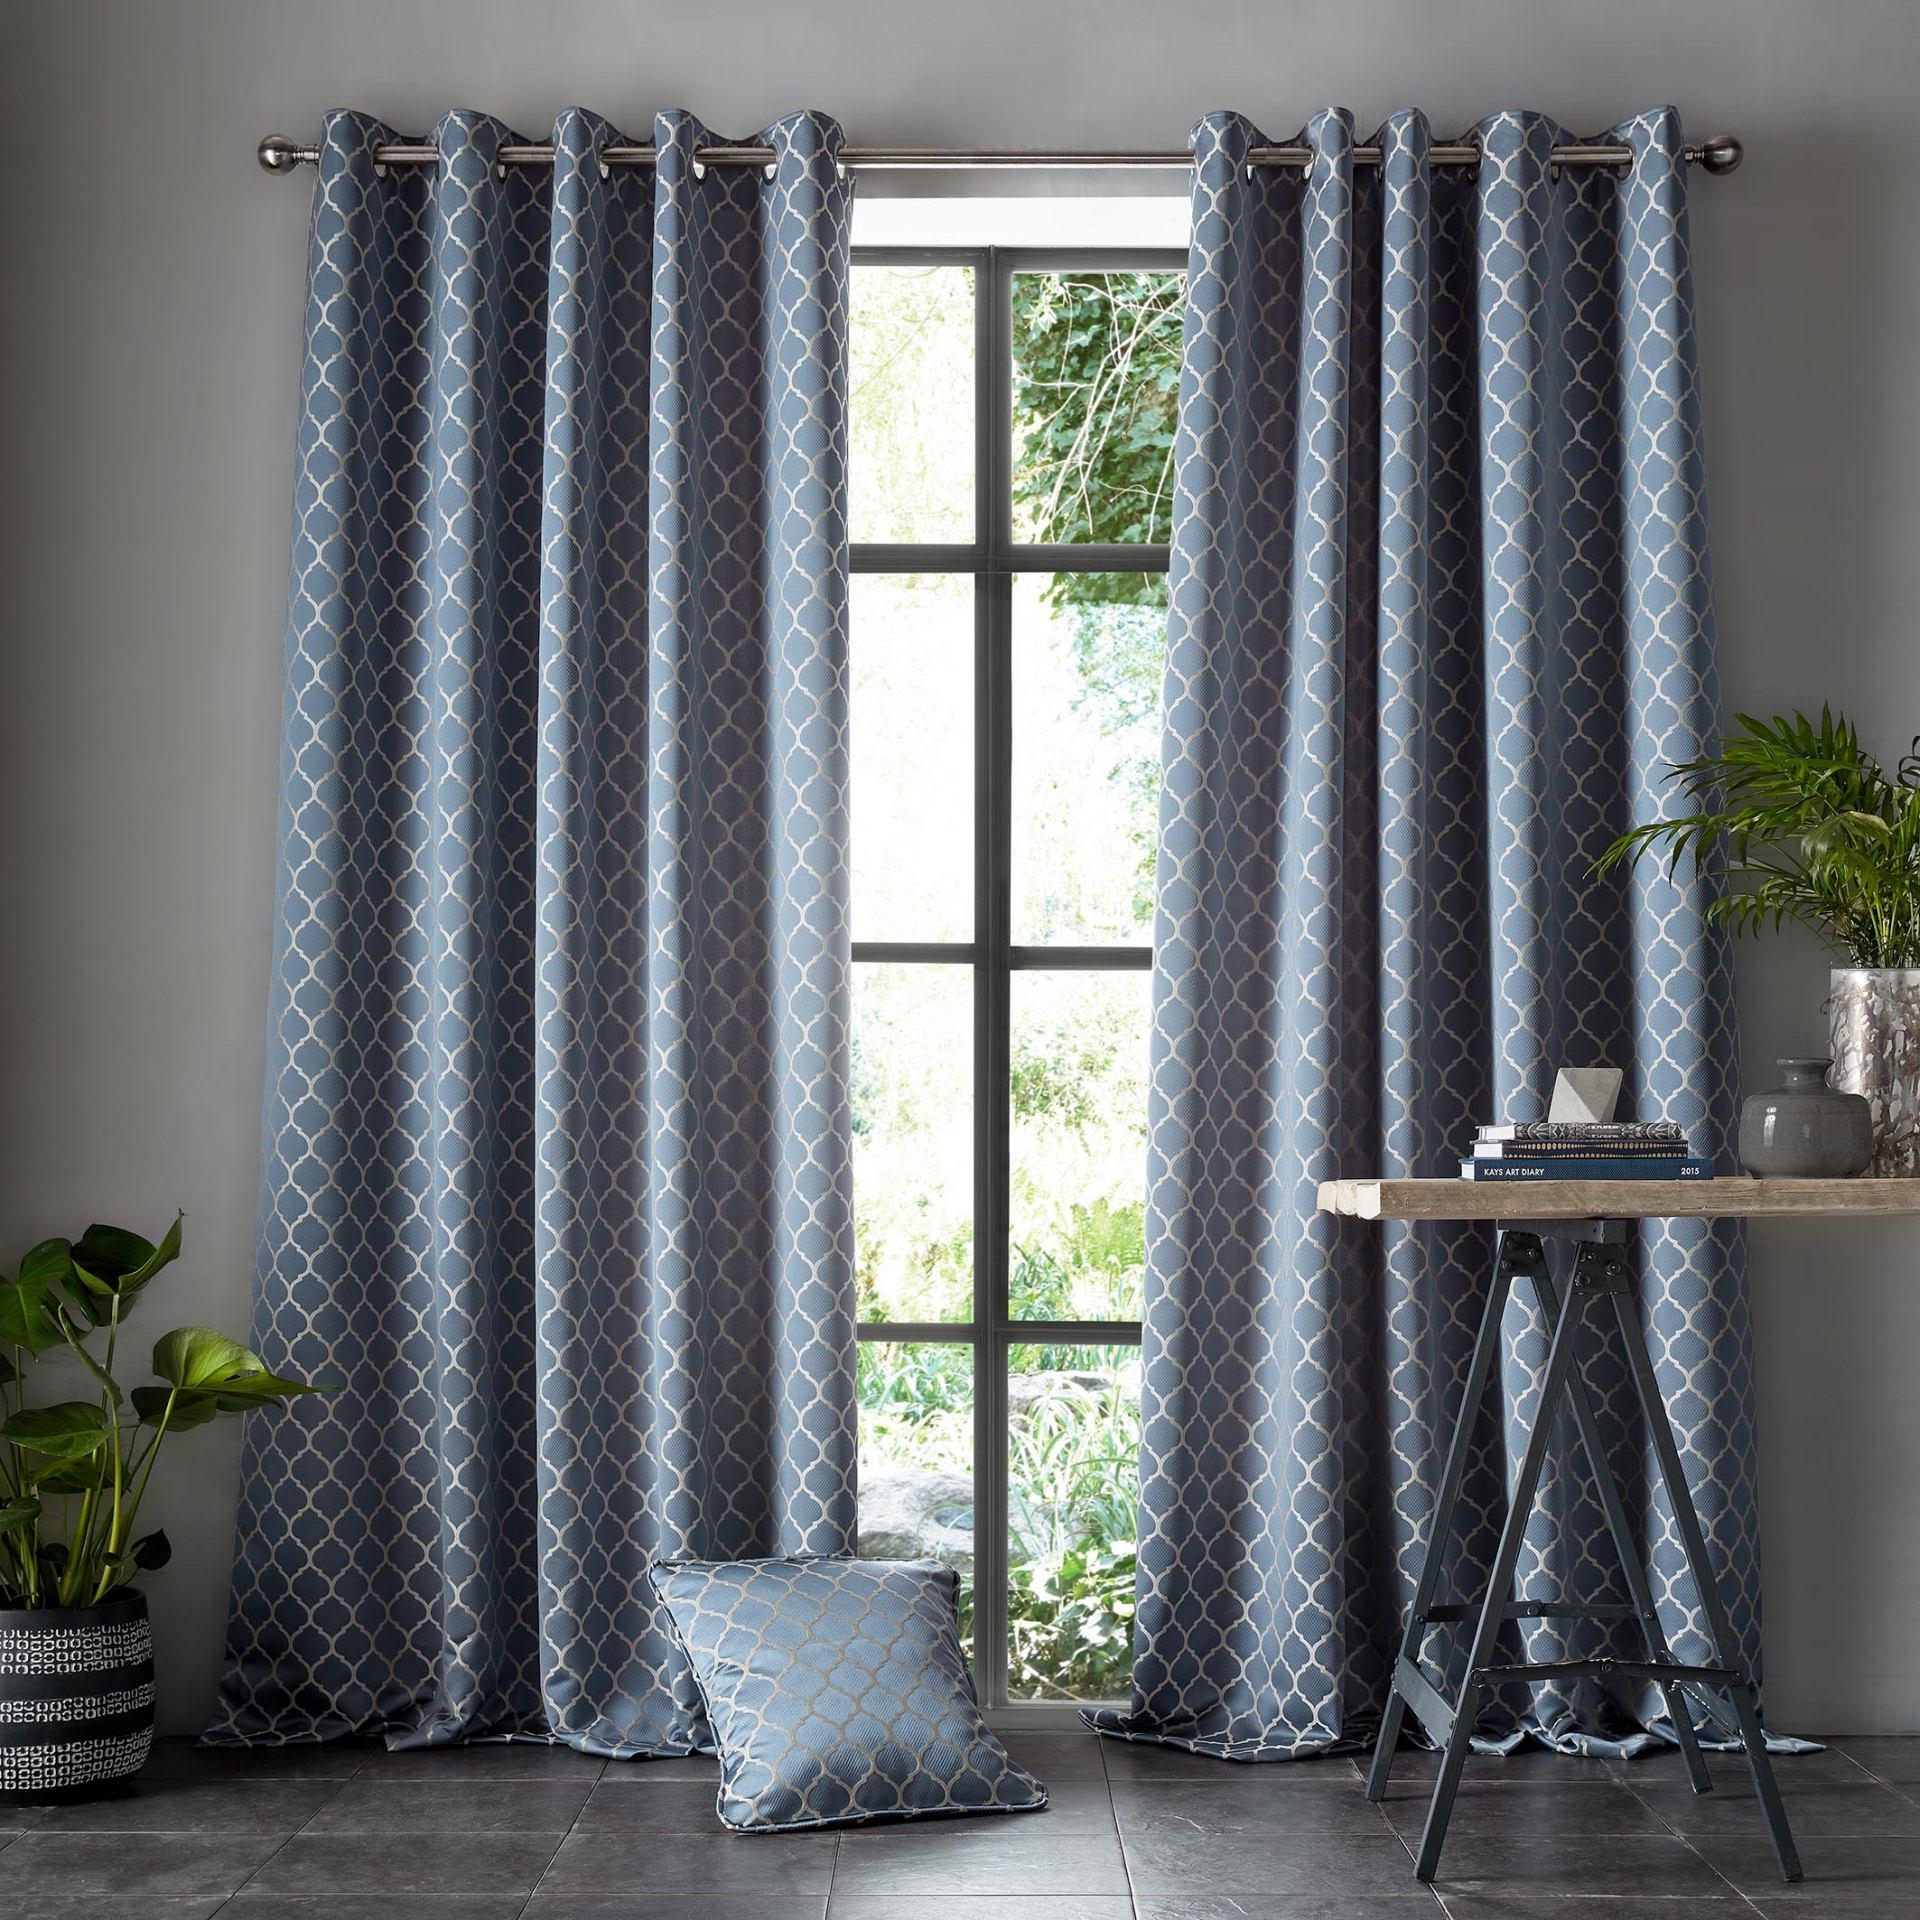 Aldbury Danube Eyelet Curtains